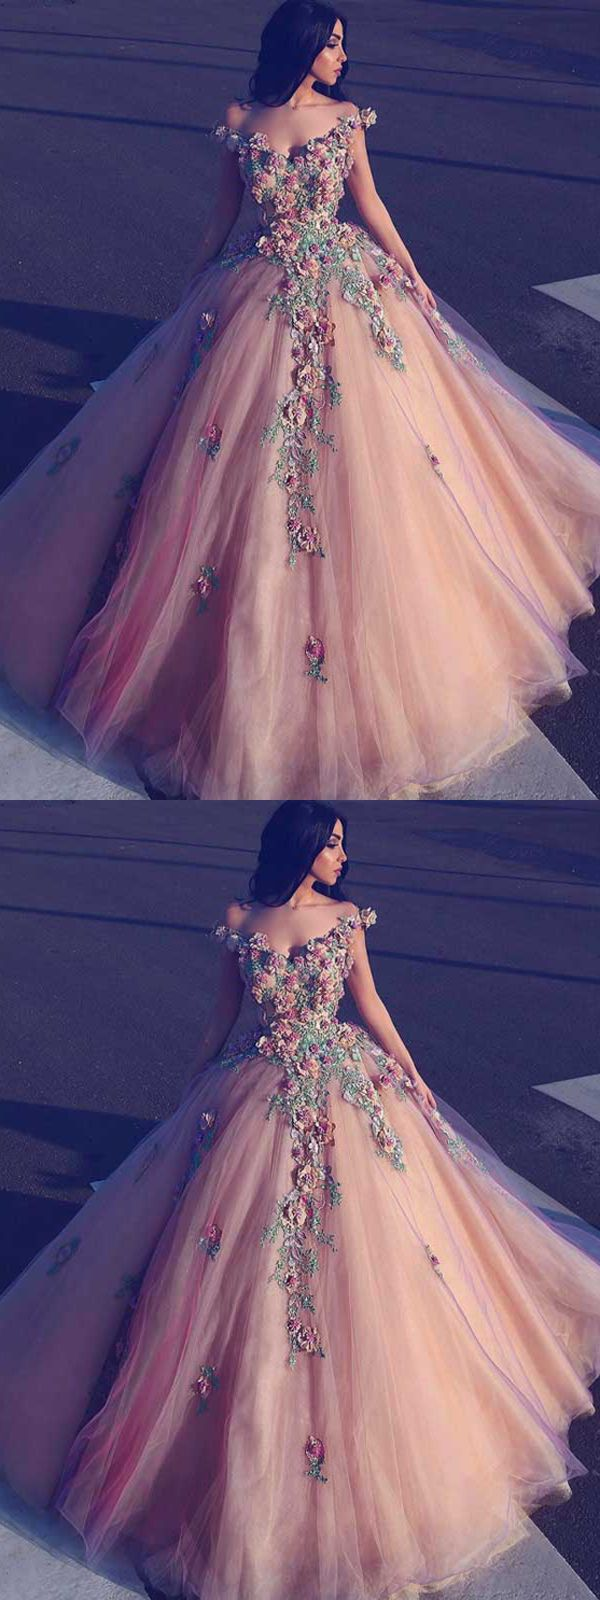 Aline prom dress modest beautiful long off the shoulder prom dress